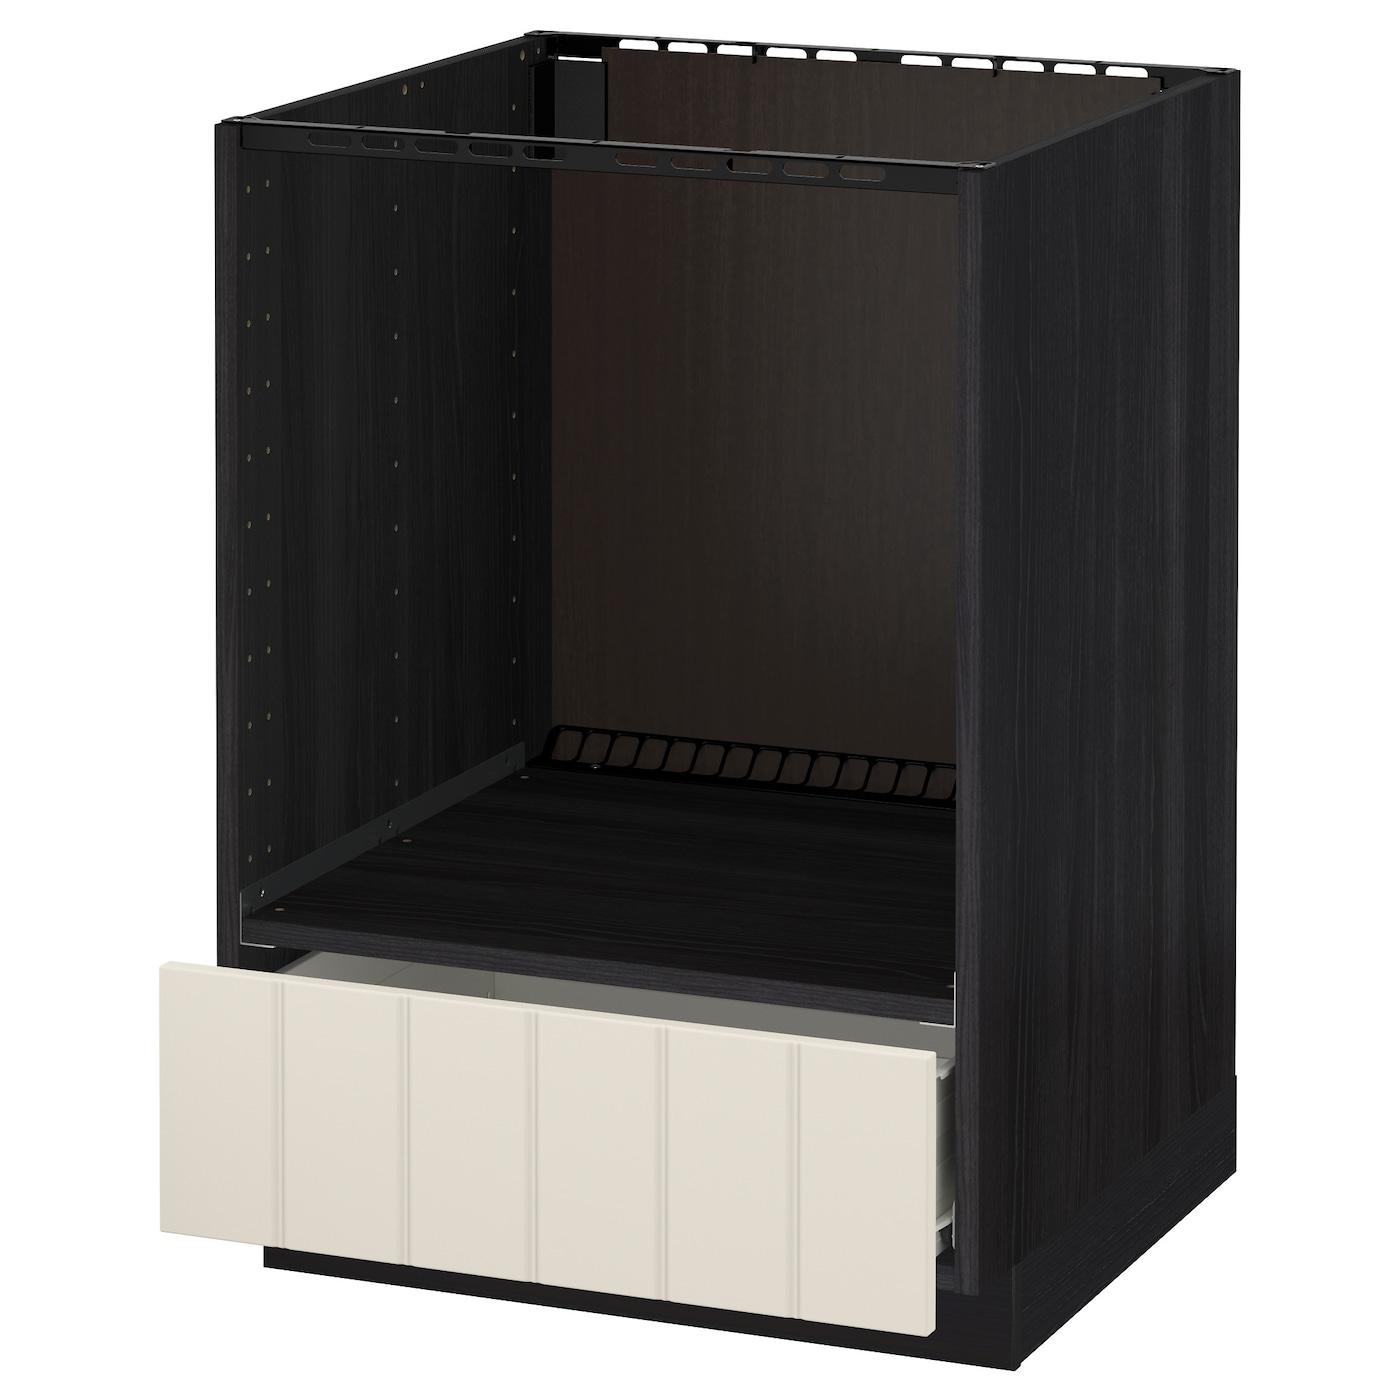 Spiegelschrank Beleuchtung Ikea: Wc spiegel ohne beleuchtung ... | {Spiegelschrank mit beleuchtung ikea 92}